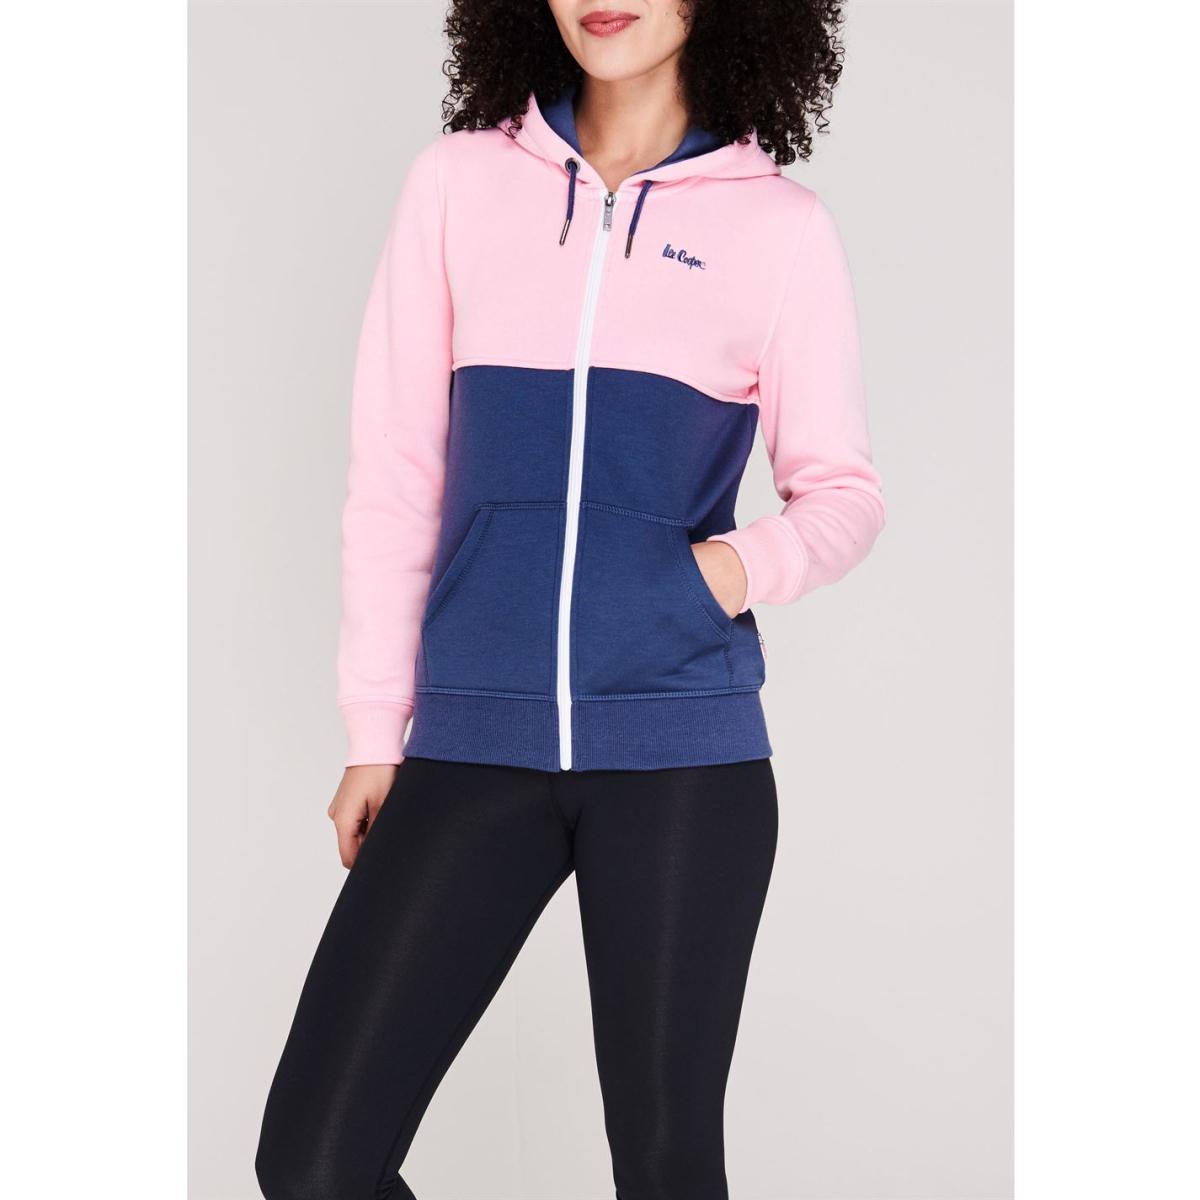 Lee Cooper Kapuzenjacke Jacke Damen Sweatshirt Kapuzenpullover Pullover 8747